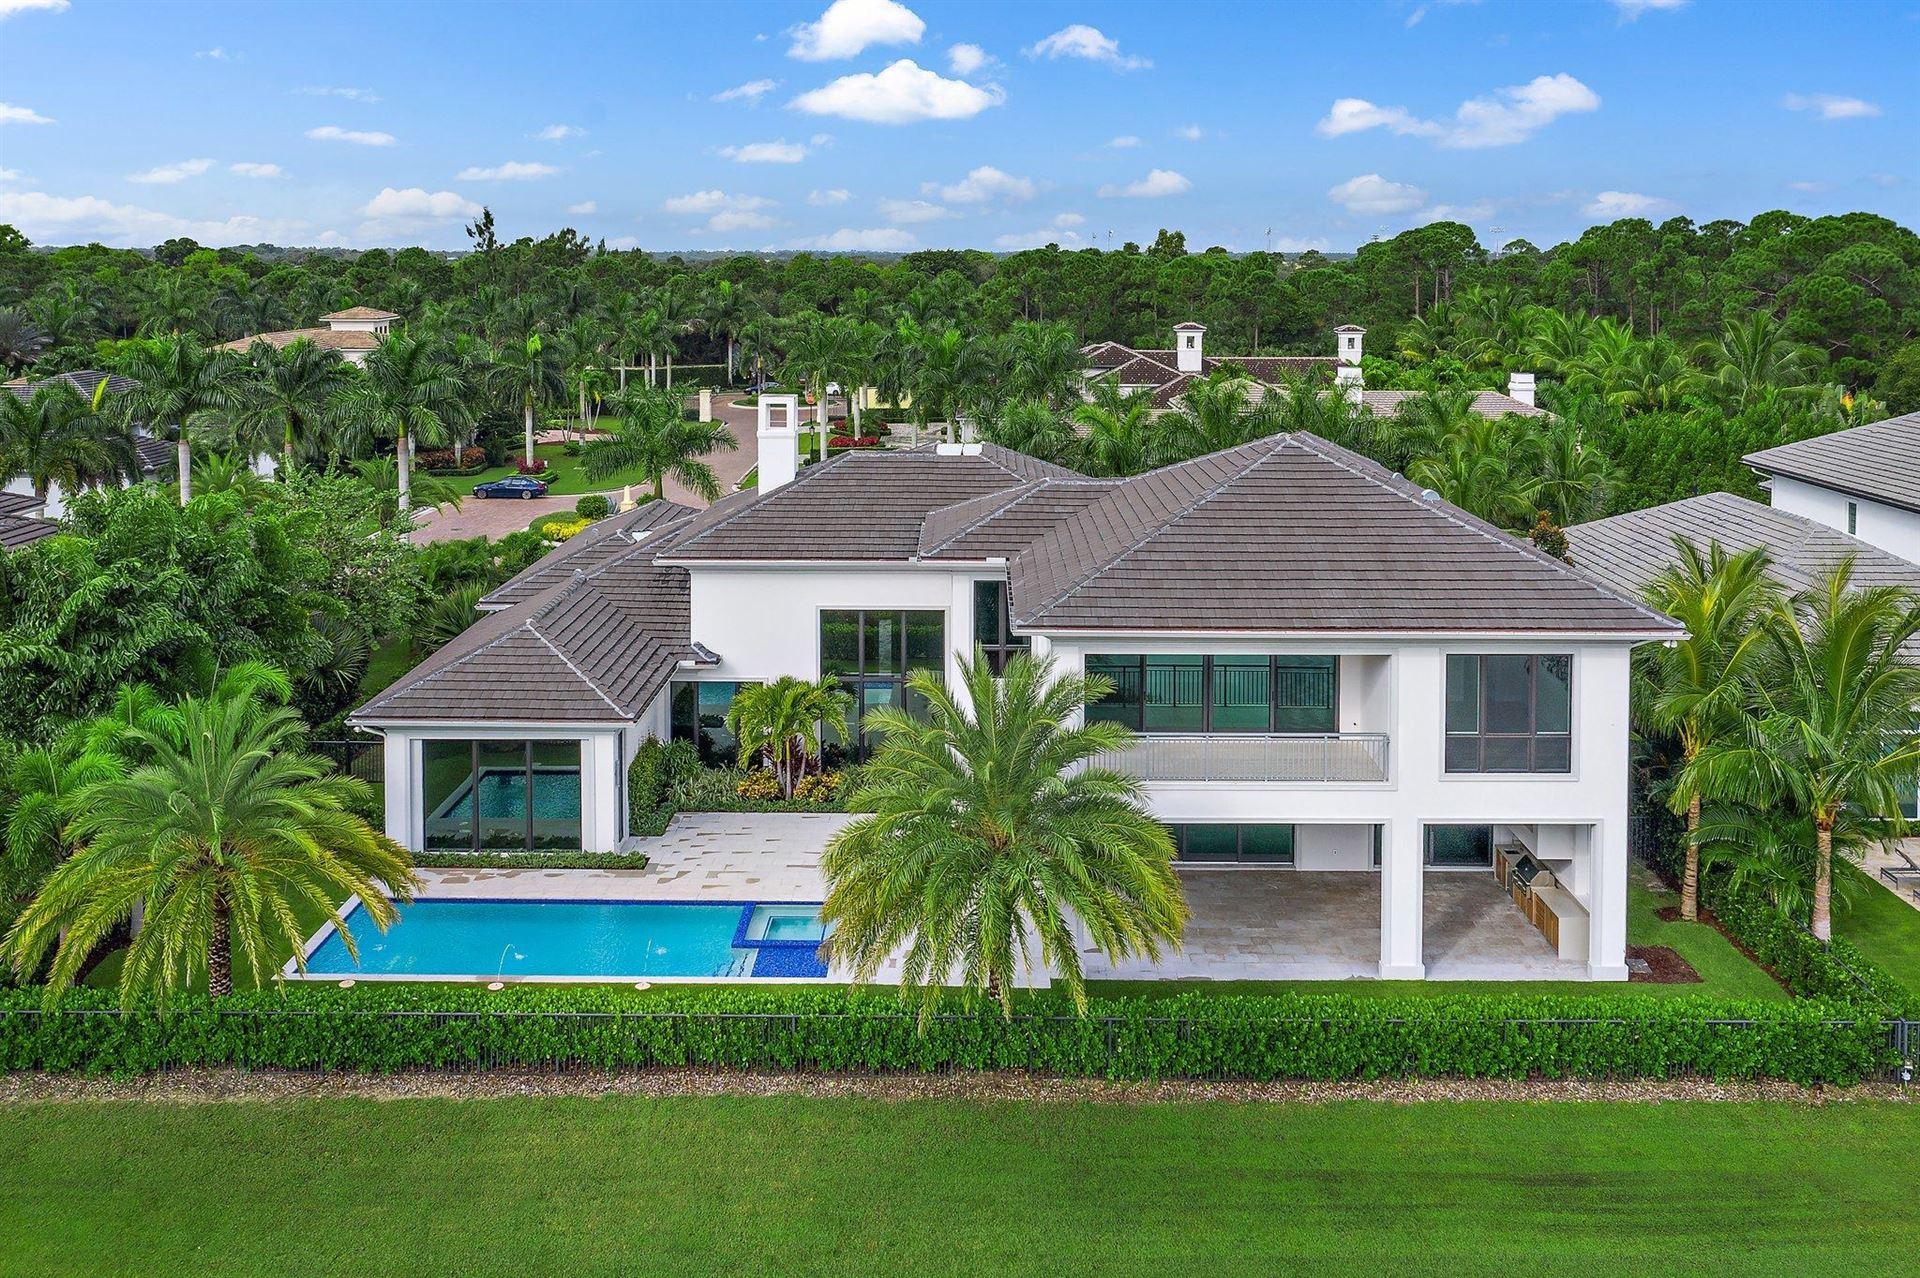 Photo of 12037 Corozo Court, Palm Beach Gardens, FL 33418 (MLS # RX-10669421)